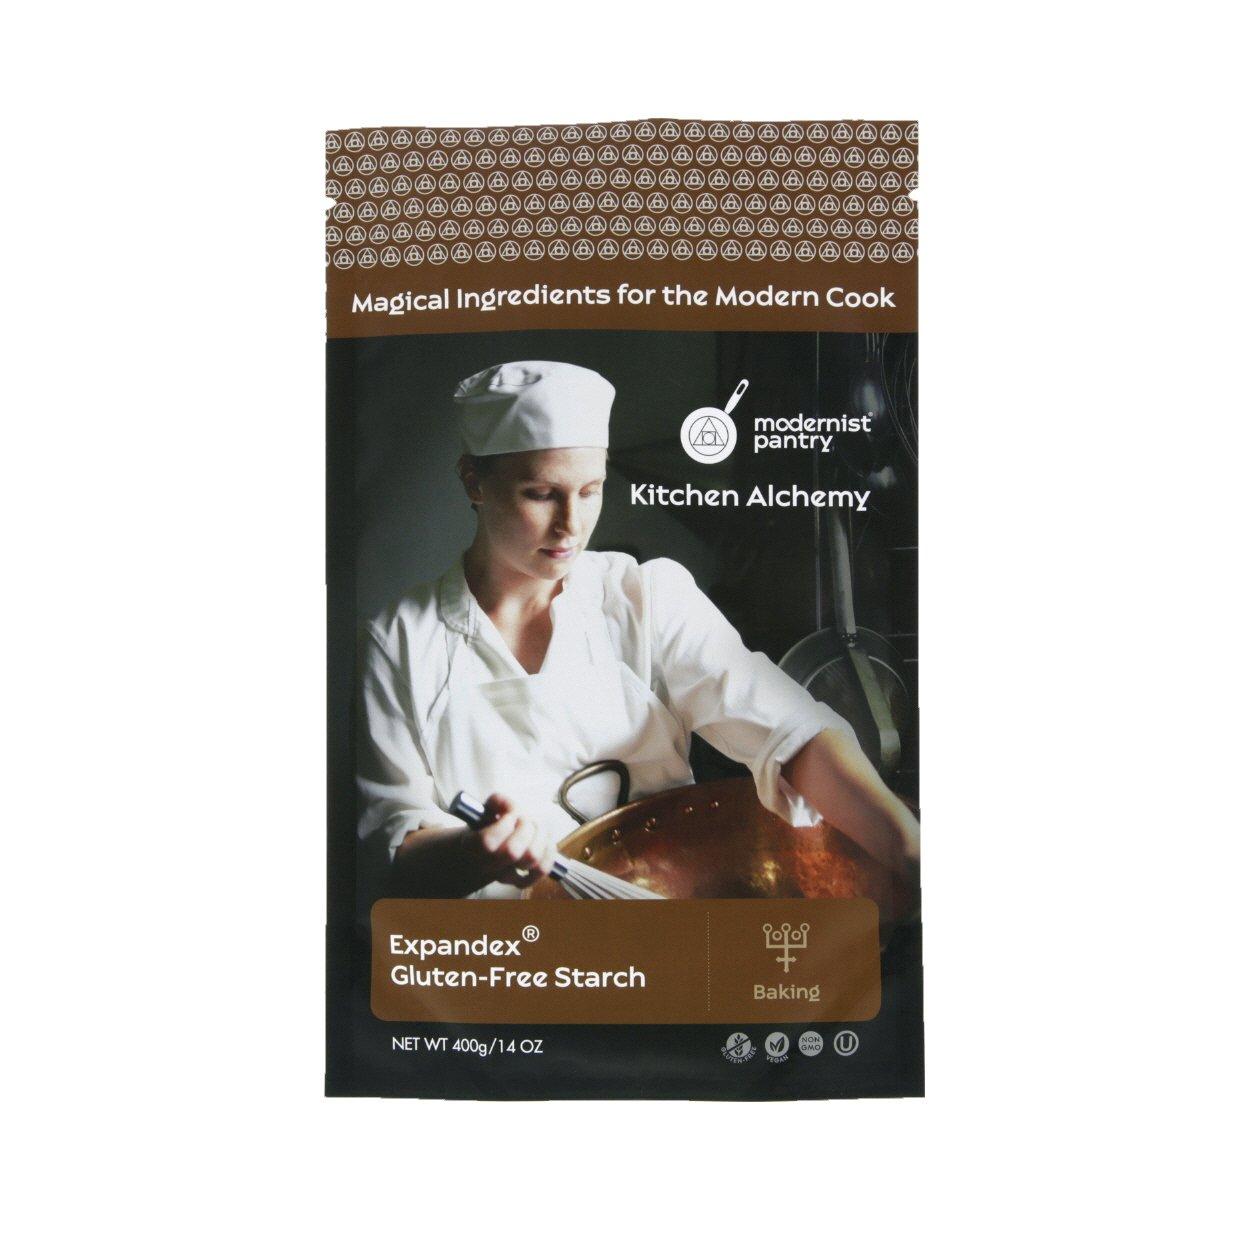 Expandex GF Tapioca Starch - 400g/14oz (Gluten-Free Baking) ⊘ Non-GMO ❤ Gluten-Free ☮ Vegan ✡ OU Kosher Certified